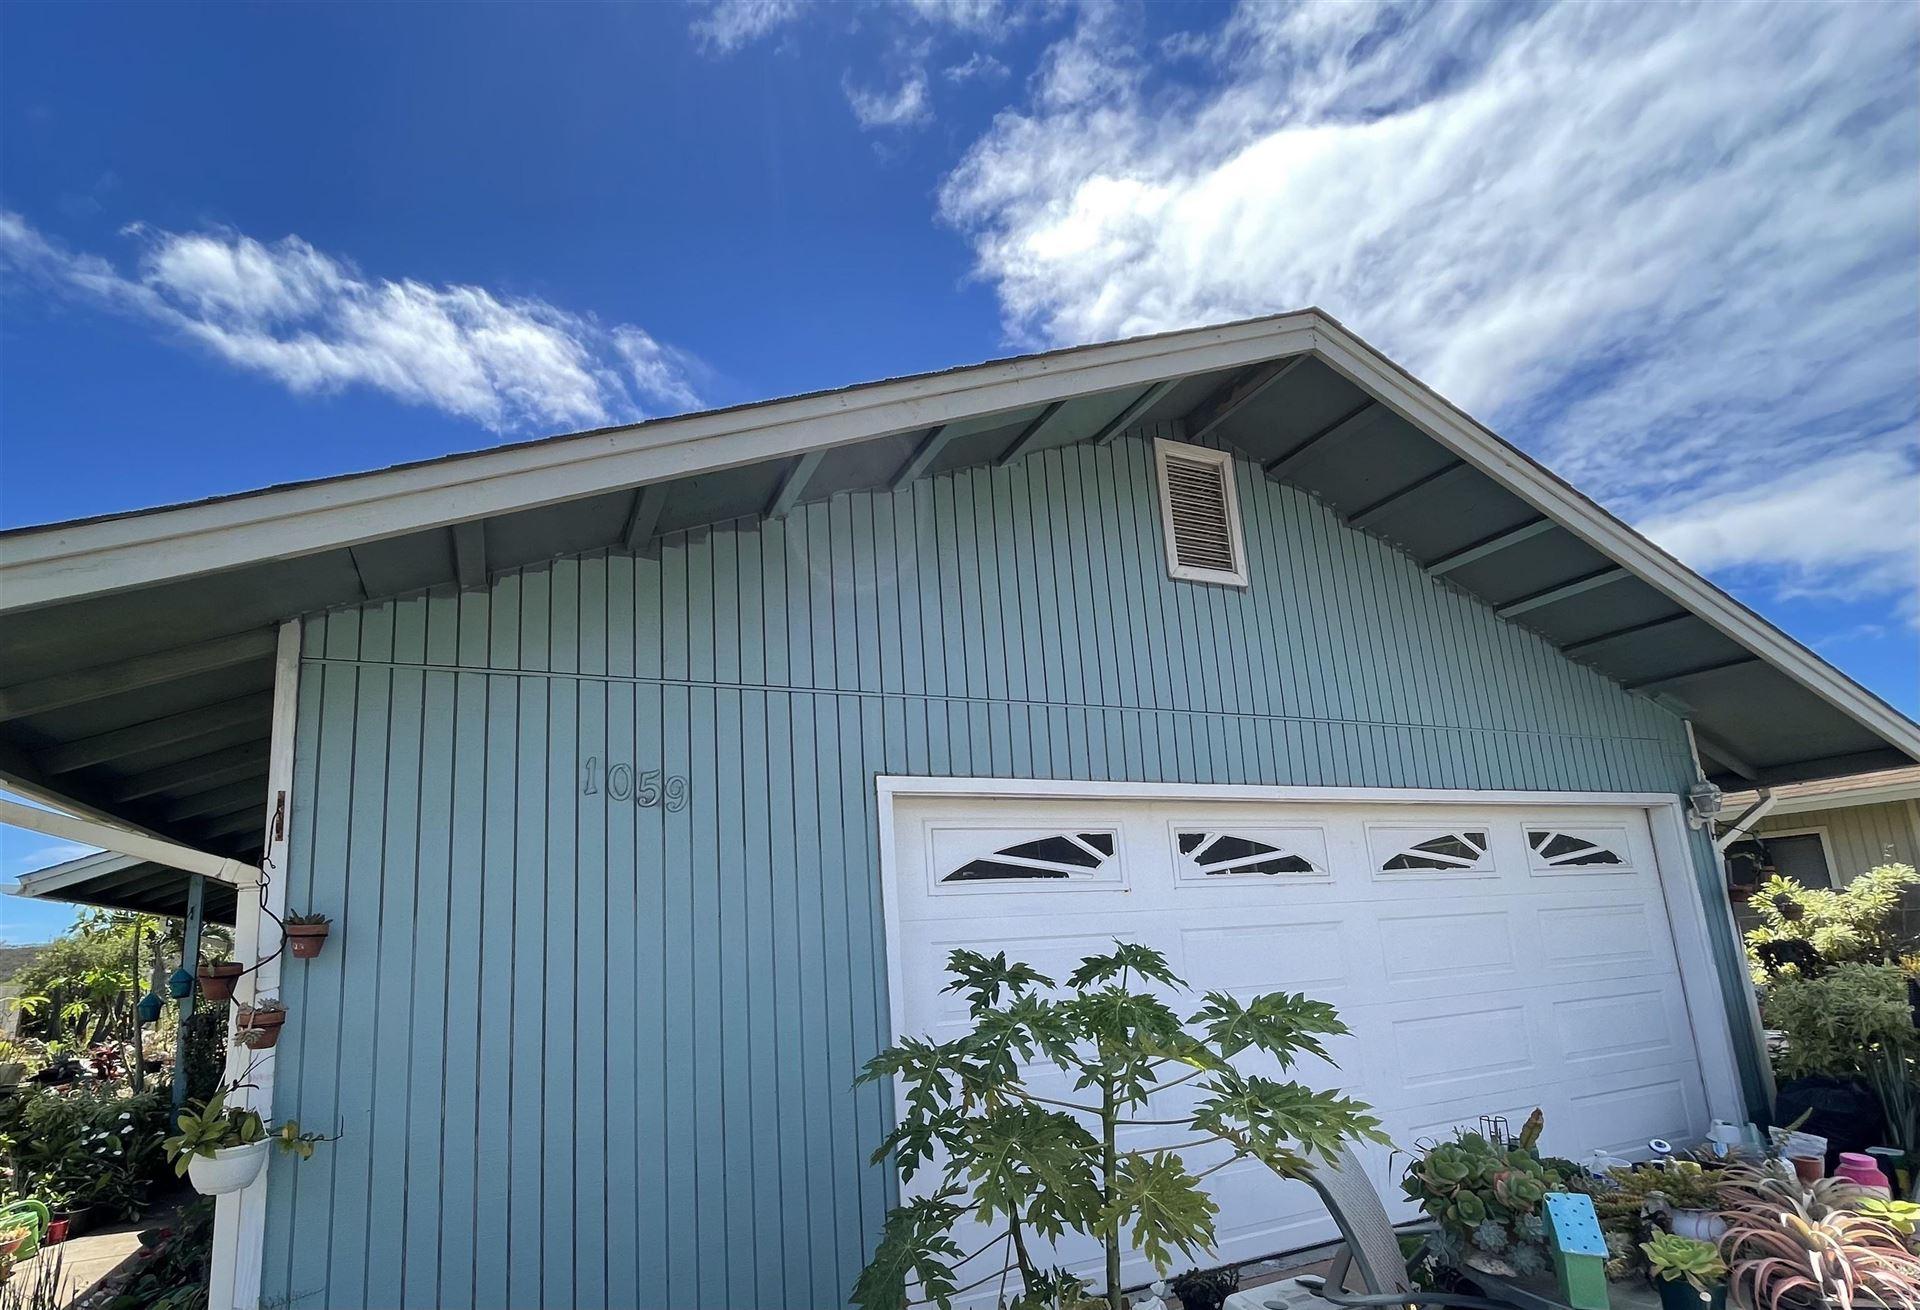 Photo of 1059 Laelae St, Wailuku, HI 96793 (MLS # 392911)